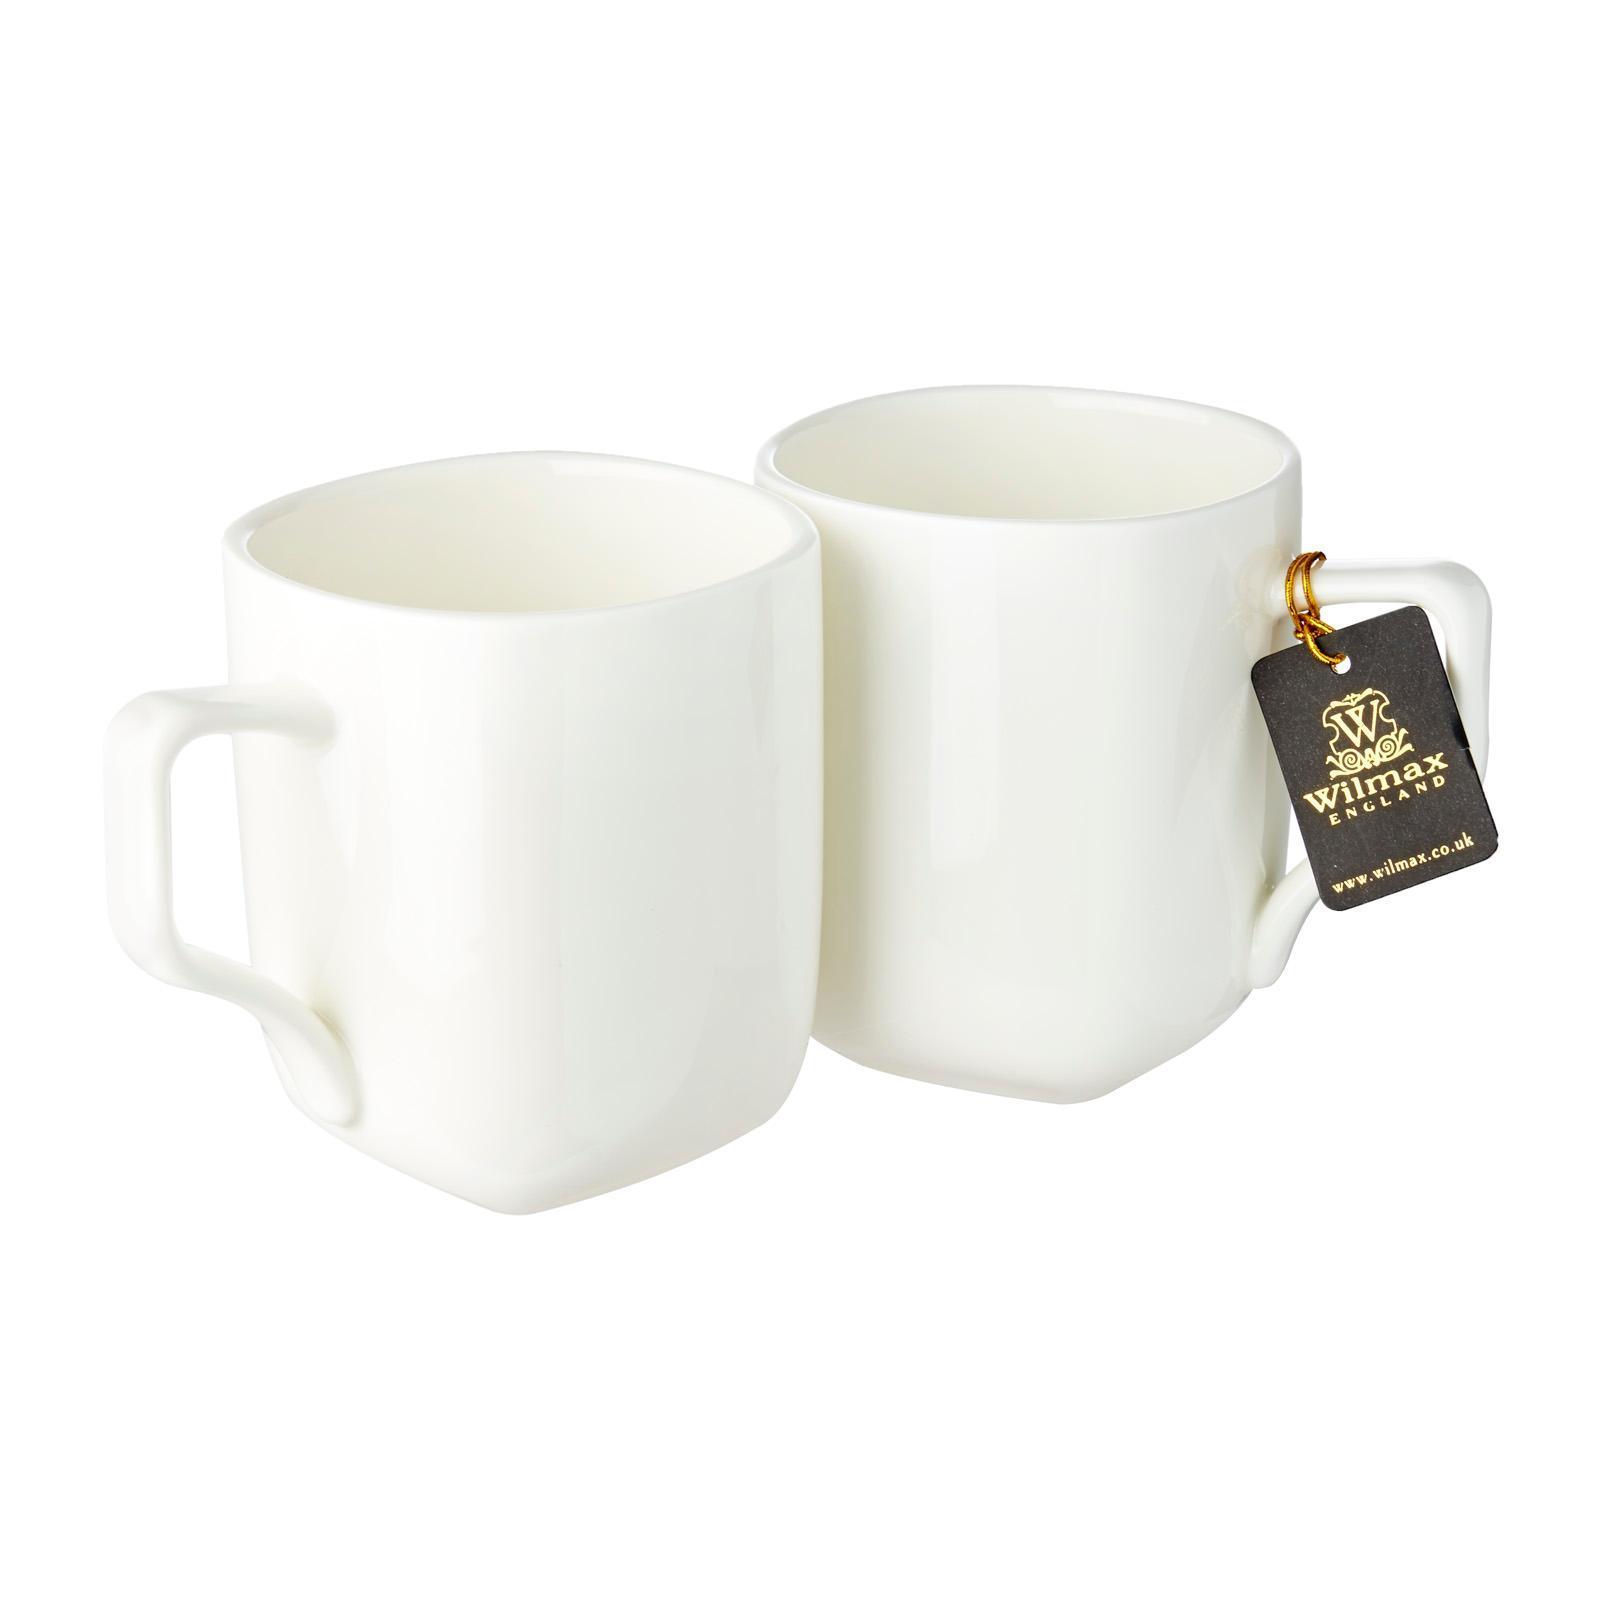 Wilmax England Porcelain Mug 2 Pcs Sets